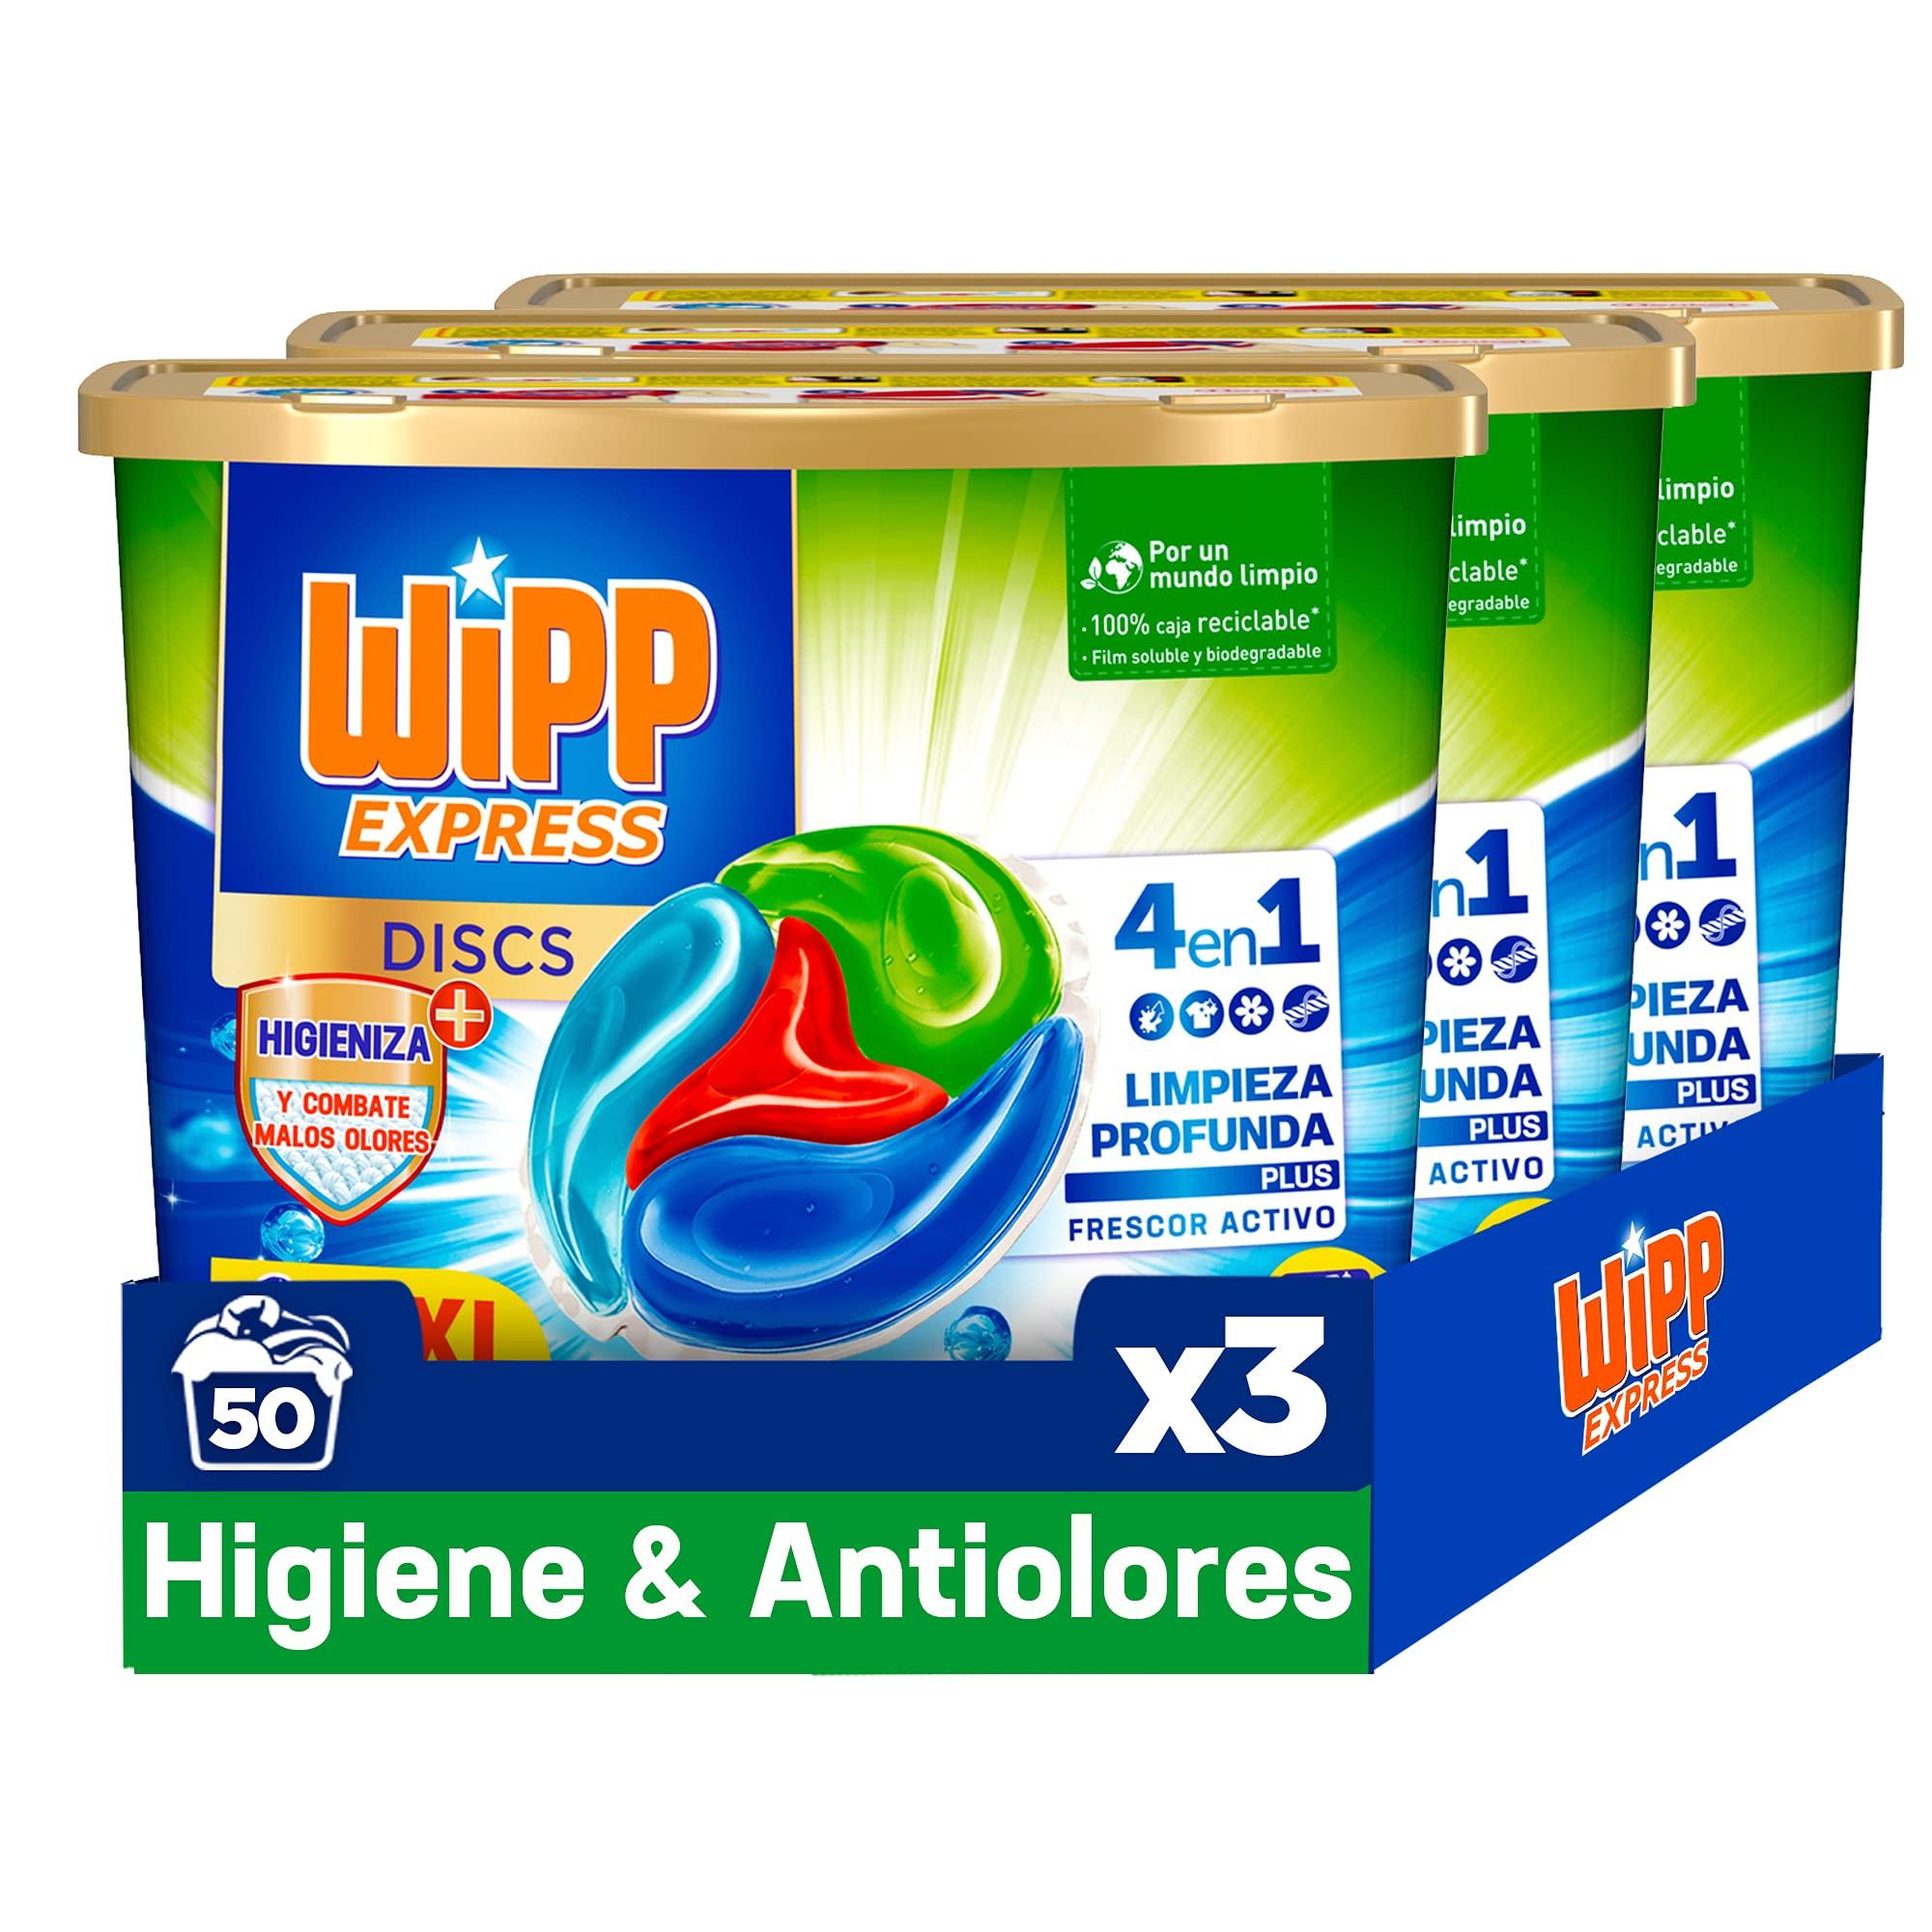 Wipp Express DISCS Higiene & Antiolores Detergente en Cápsulas 4 en 1. 50 Discos, Pack de 3, Total: 150 Discos